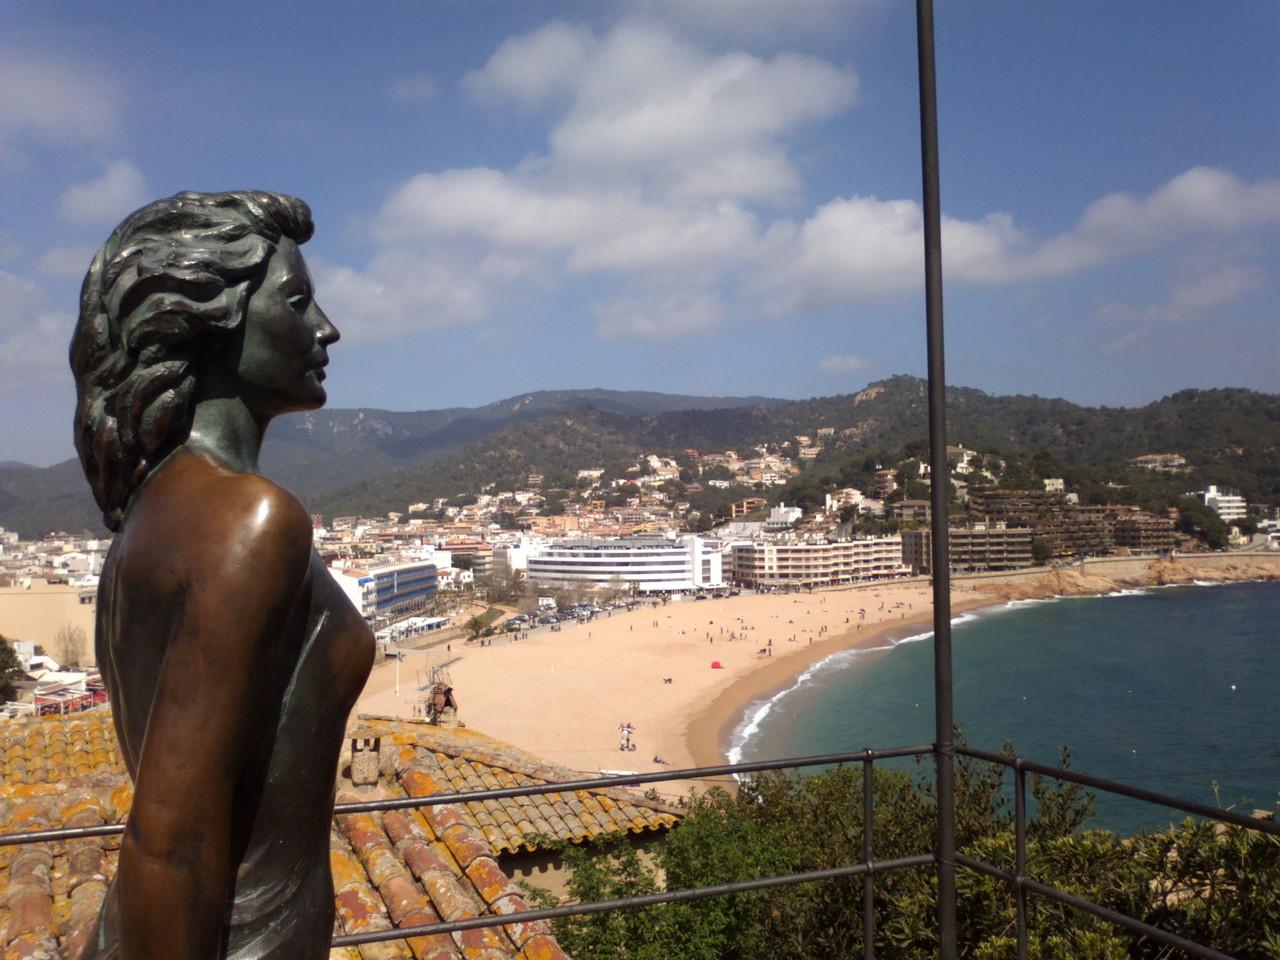 Statue of Ava Gardner, life-size, in Tossa